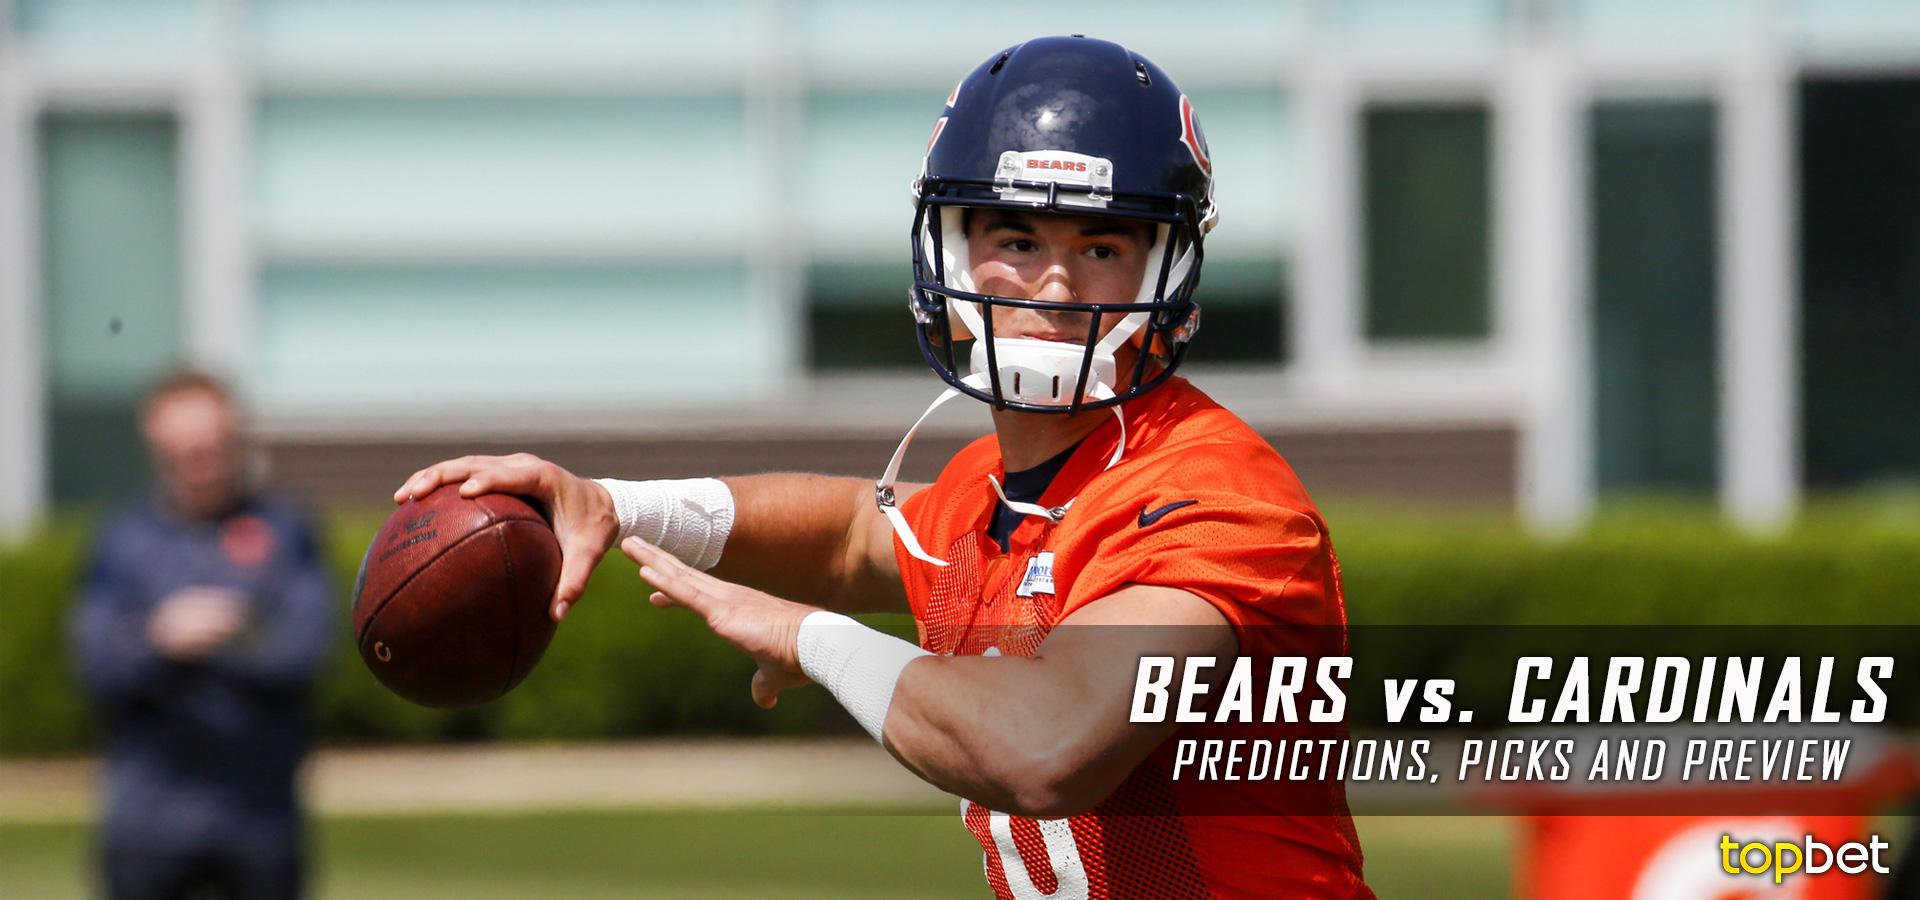 Bears vs Cardinals 2017 NFL Preseason Predictions & Preview